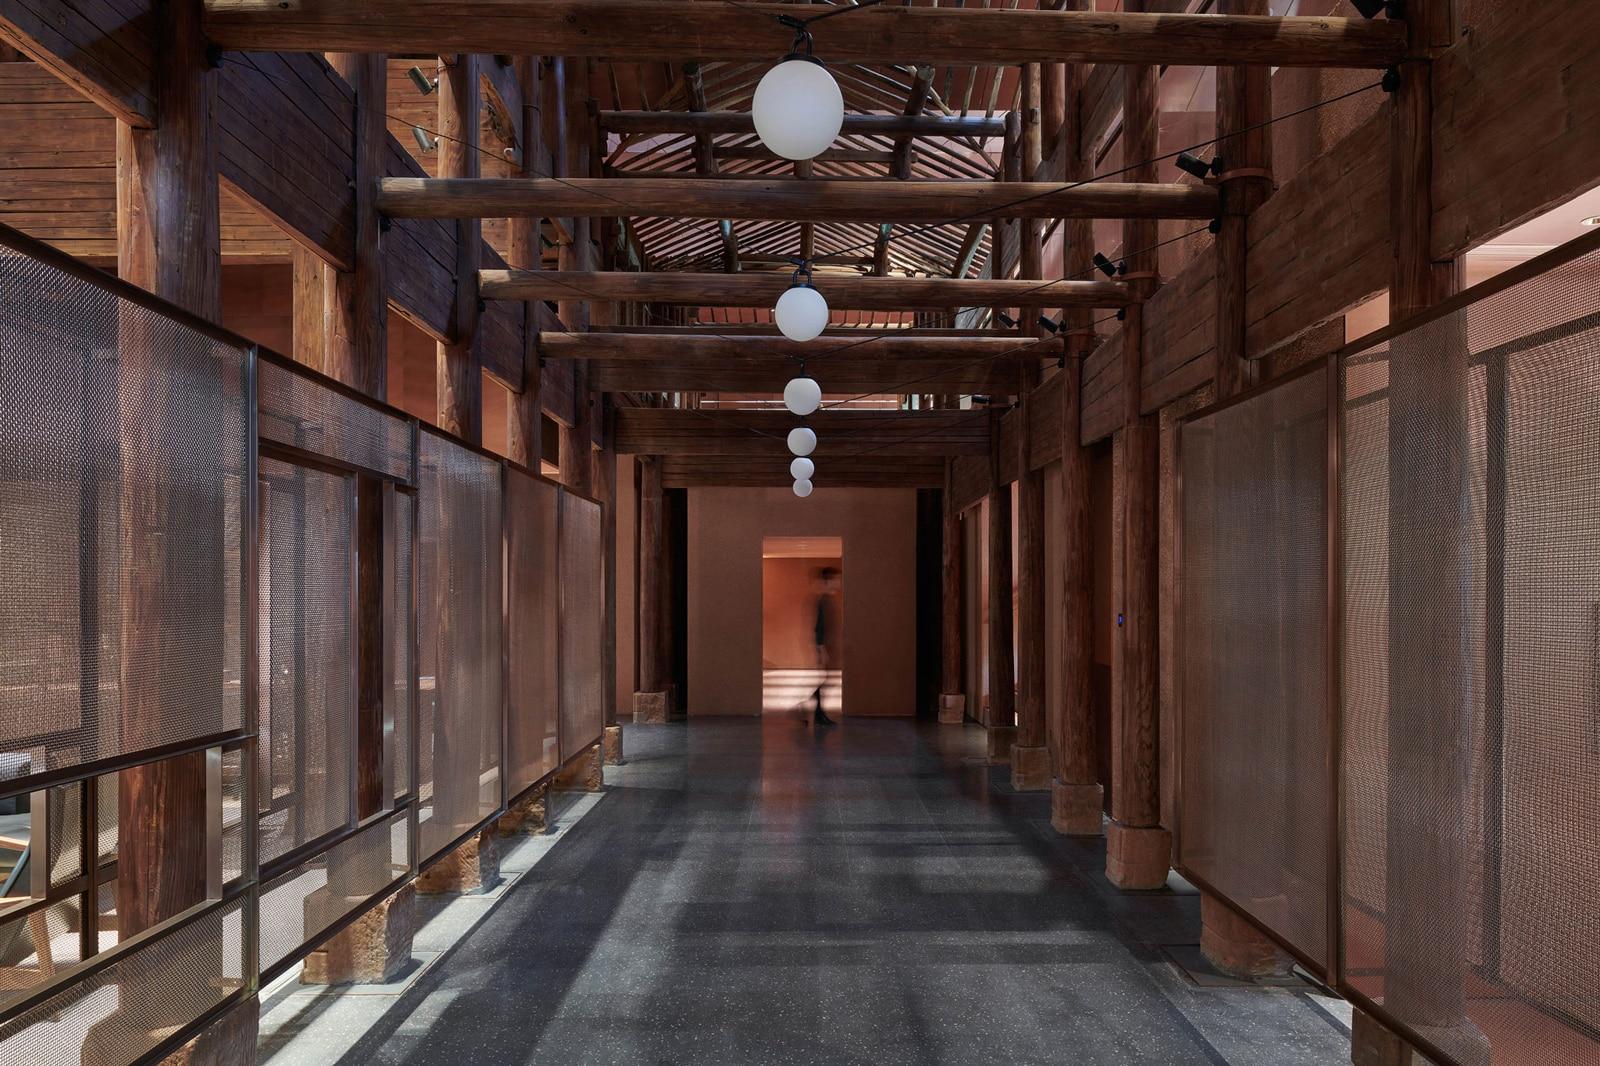 Fuzhou Teahouse  - 20210809 NeriHu FuzhouTeahouse 06 42